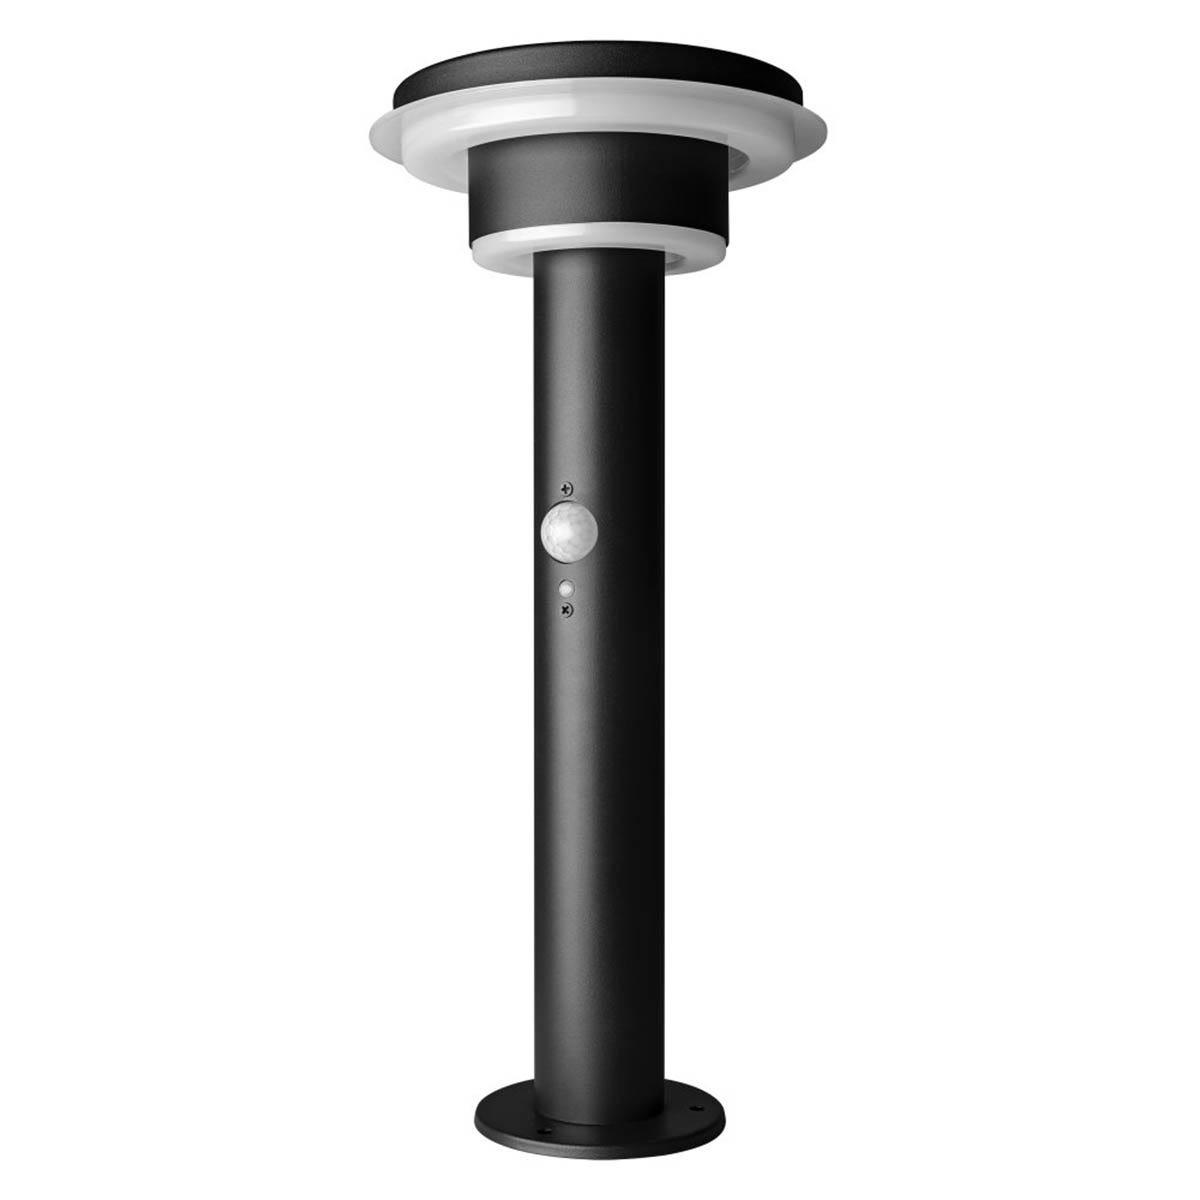 Ledvance Endura Solar Style Circle Garden Light with Sensor - Black